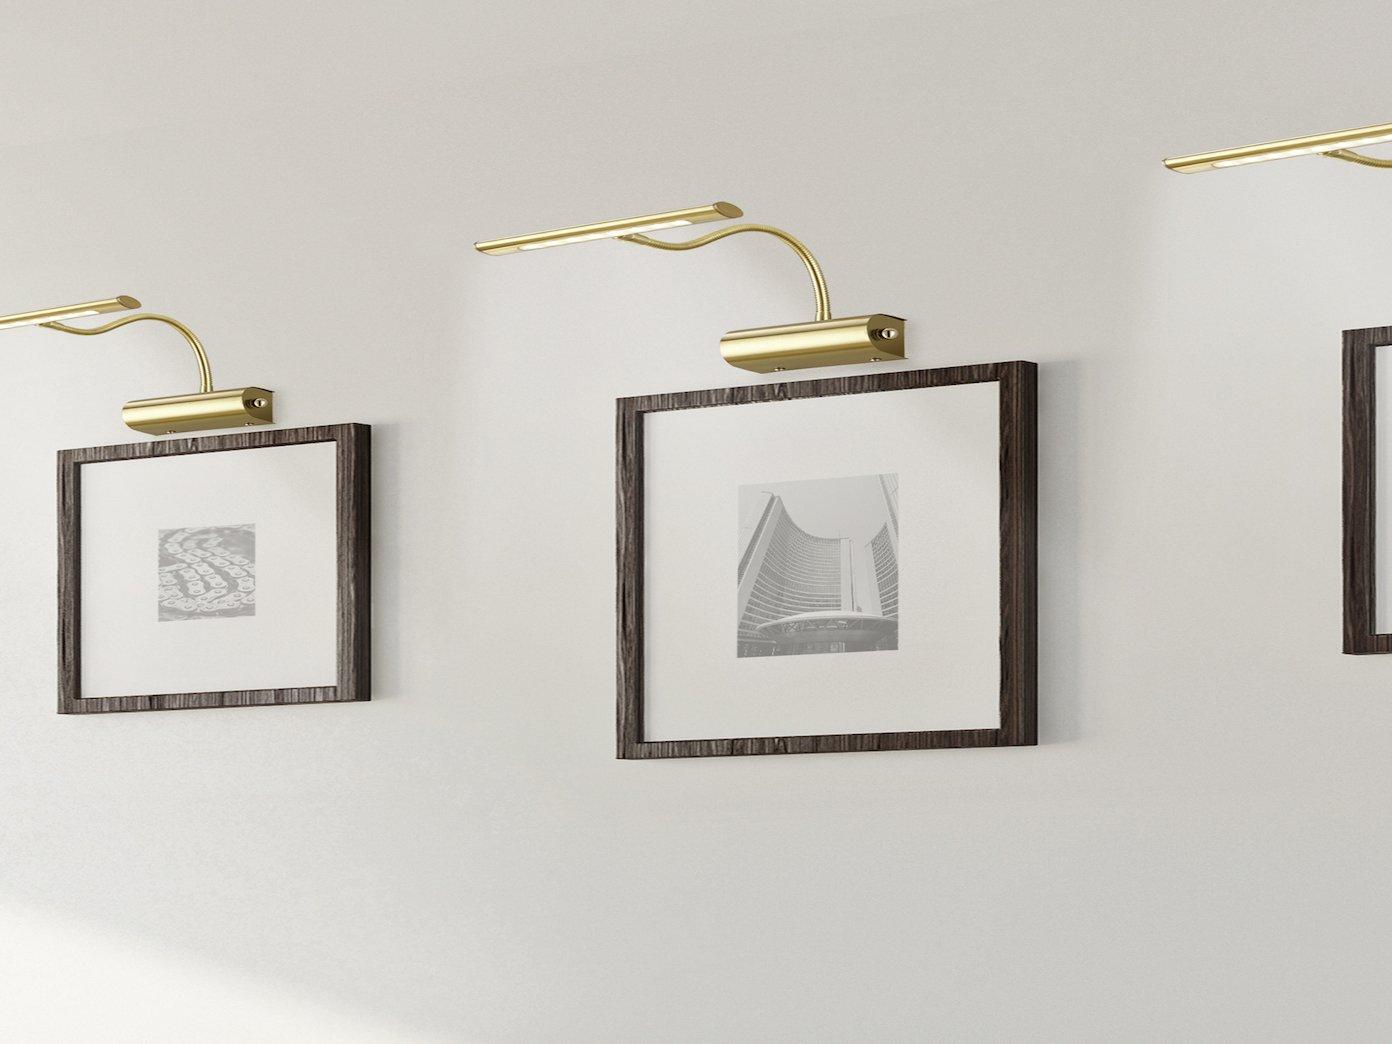 2er Set Klassische LED Bilderleuchten flexibel Spiegelleuchte in Messing dimmbar